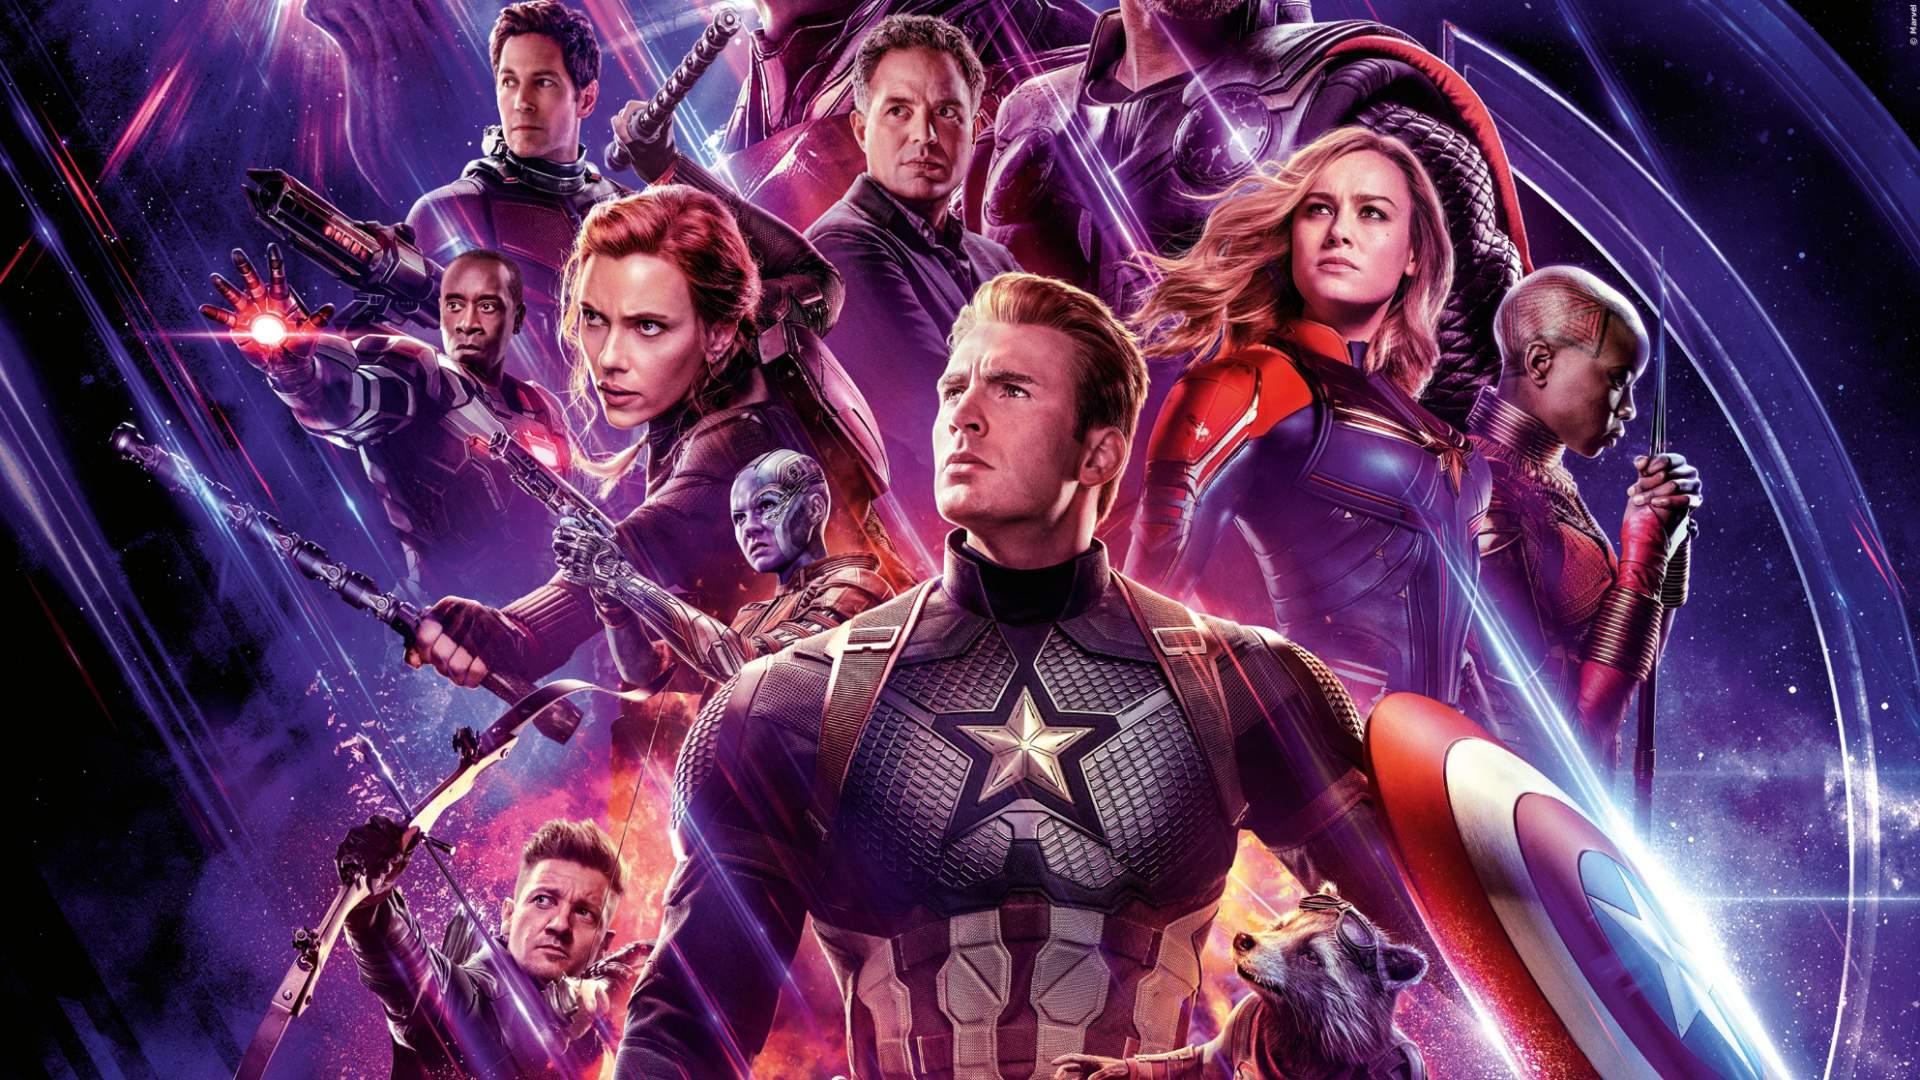 END-ENDGAME: 'Avengers 4' kommt mit neuen Szenen zurück ins Kino